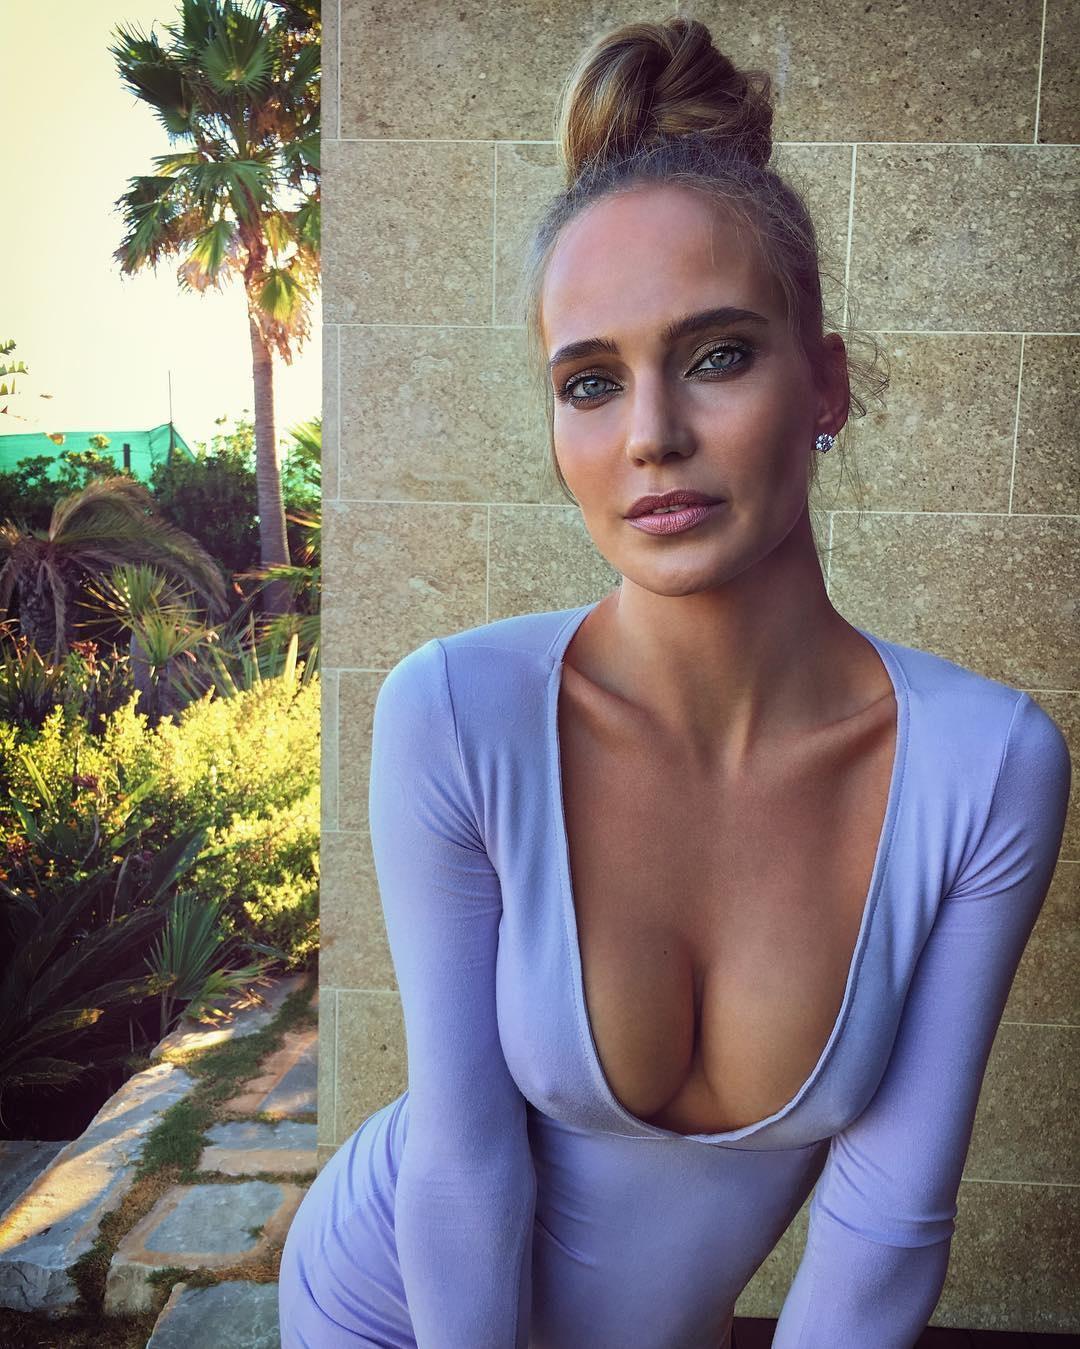 Горлая грудь